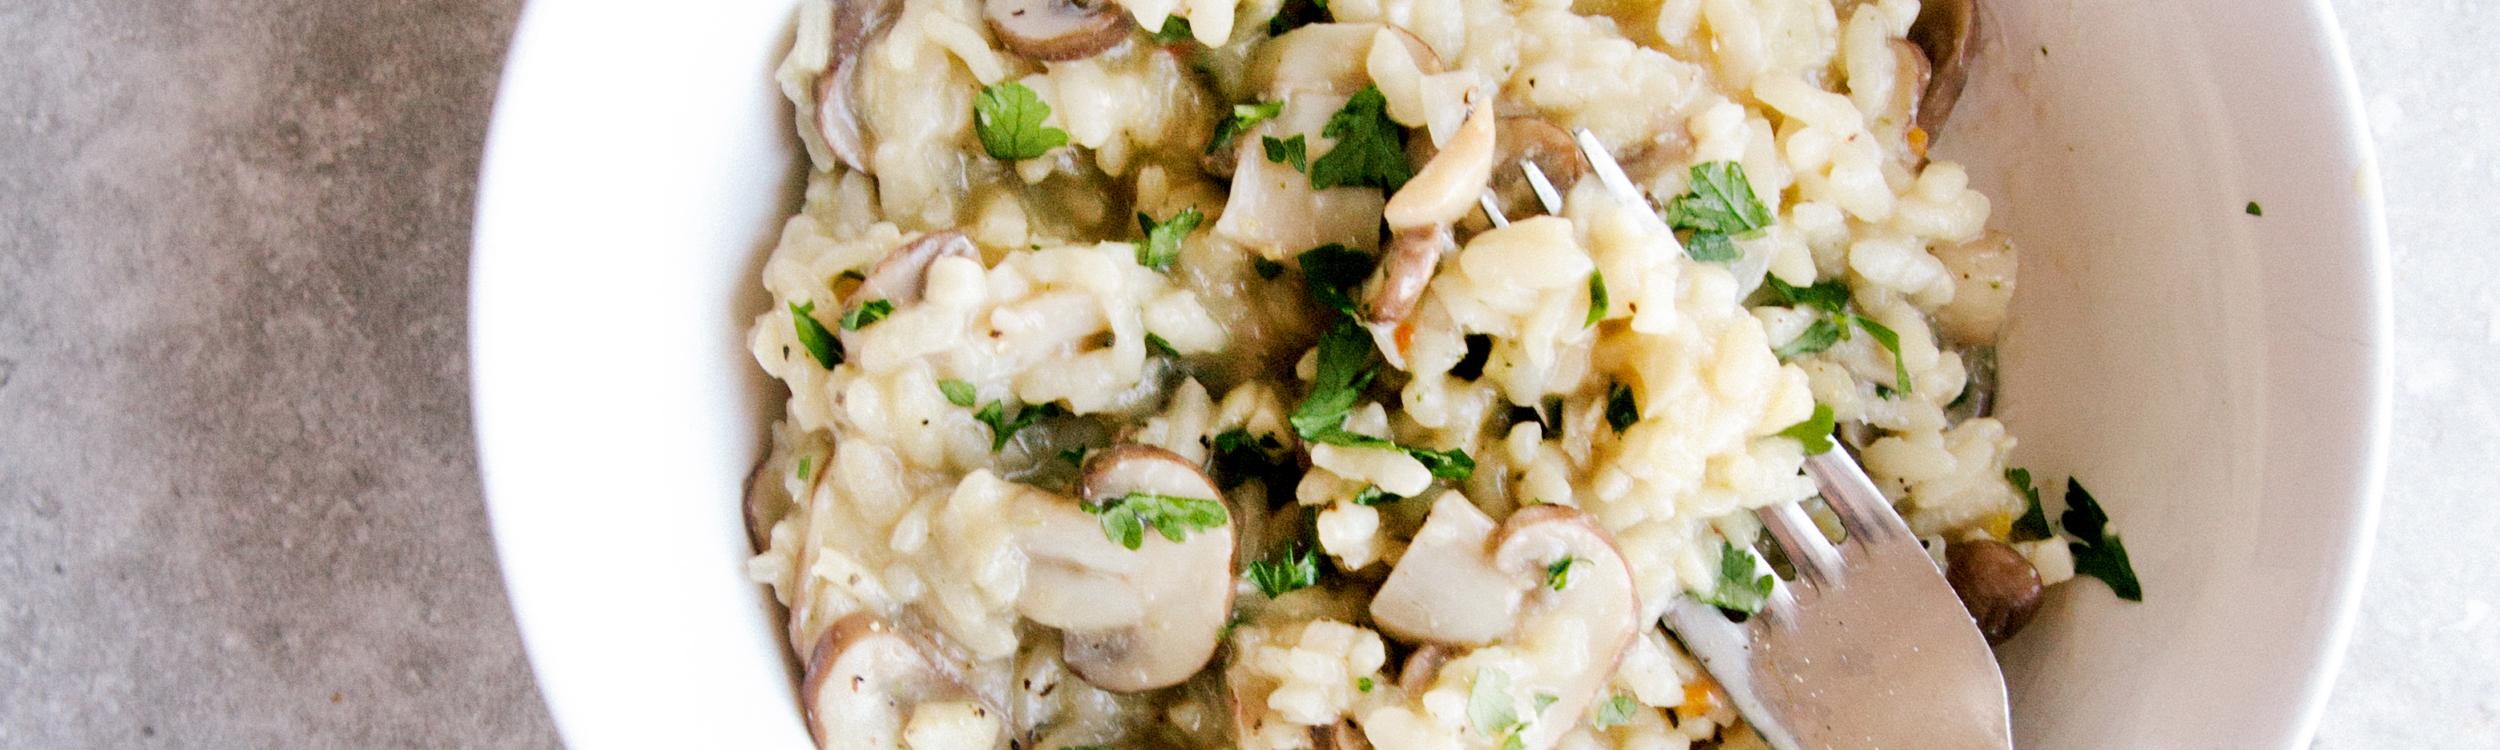 Creamy Mushroom Risotto (V + GF)